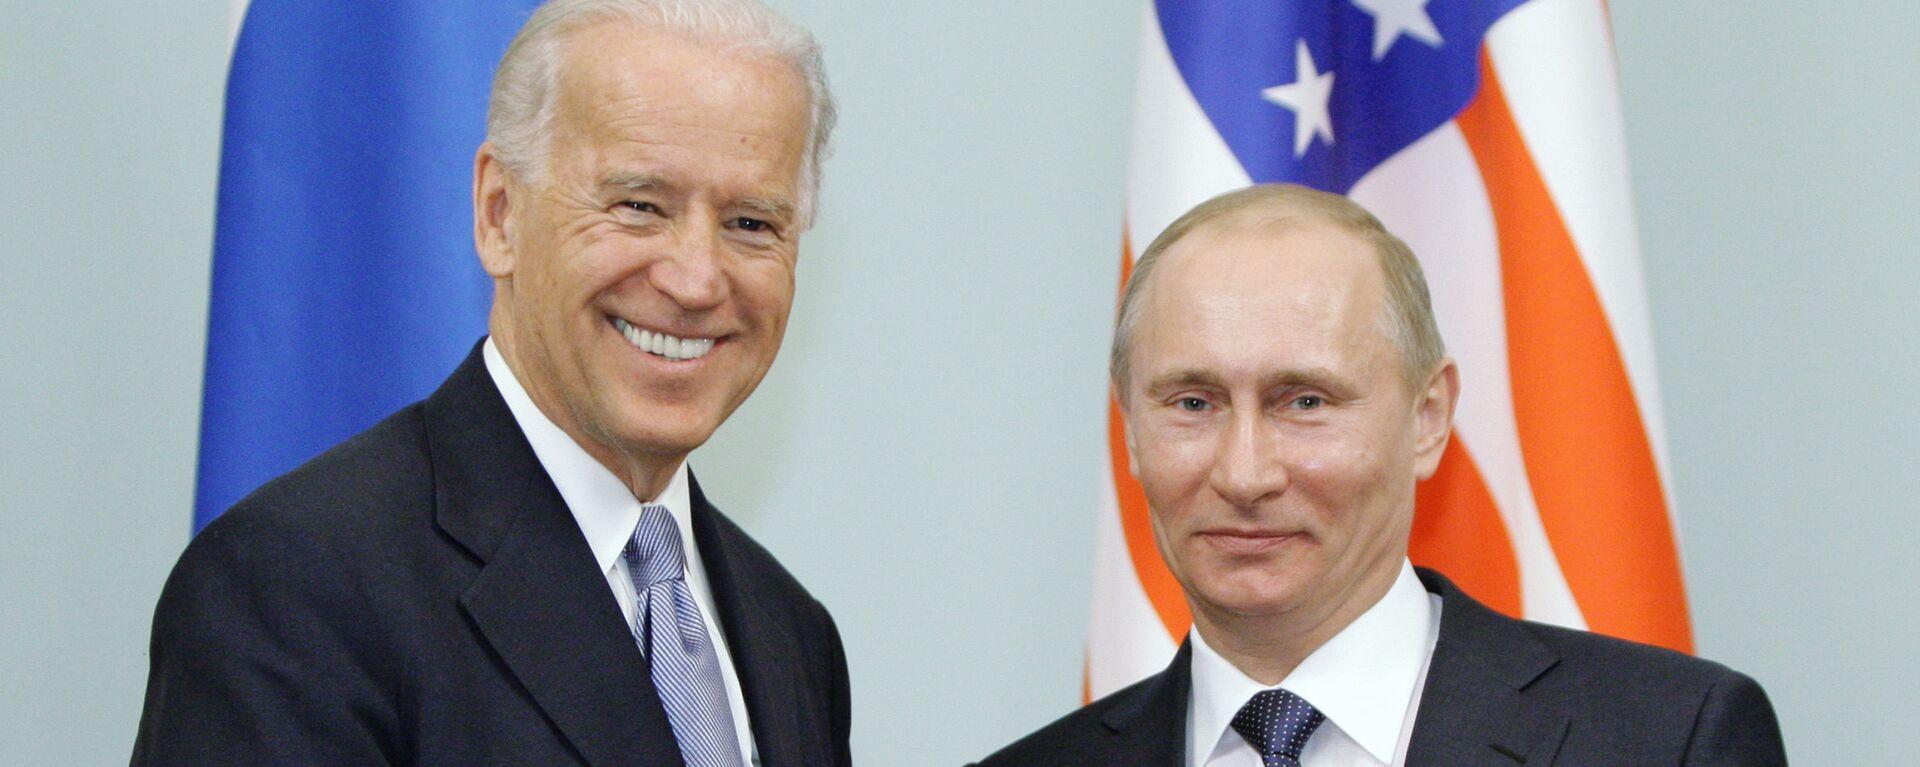 Joe Biden y Vladímir Putin en Rusia (archivo, año 2011) - Sputnik Mundo, 1920, 10.11.2020